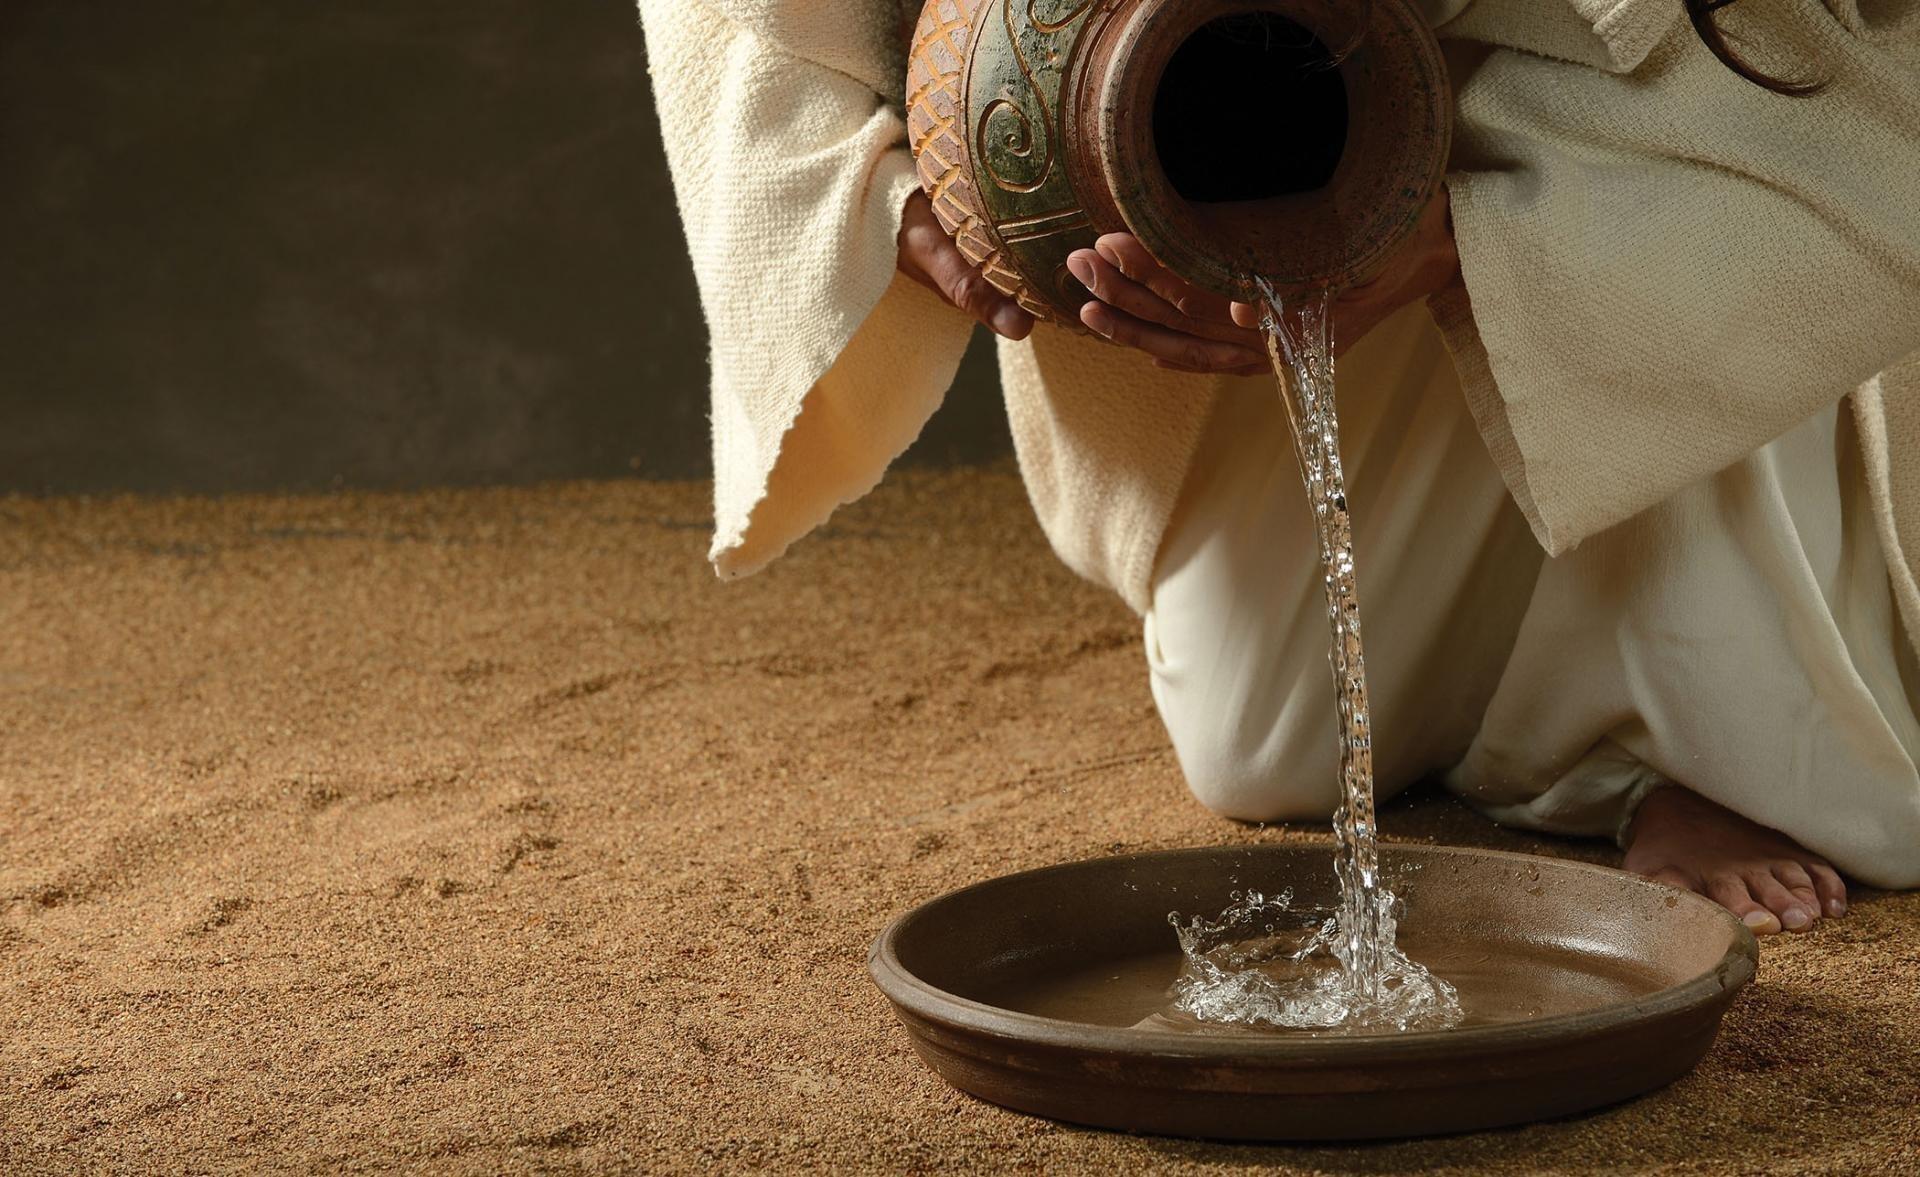 Заклинание на воду